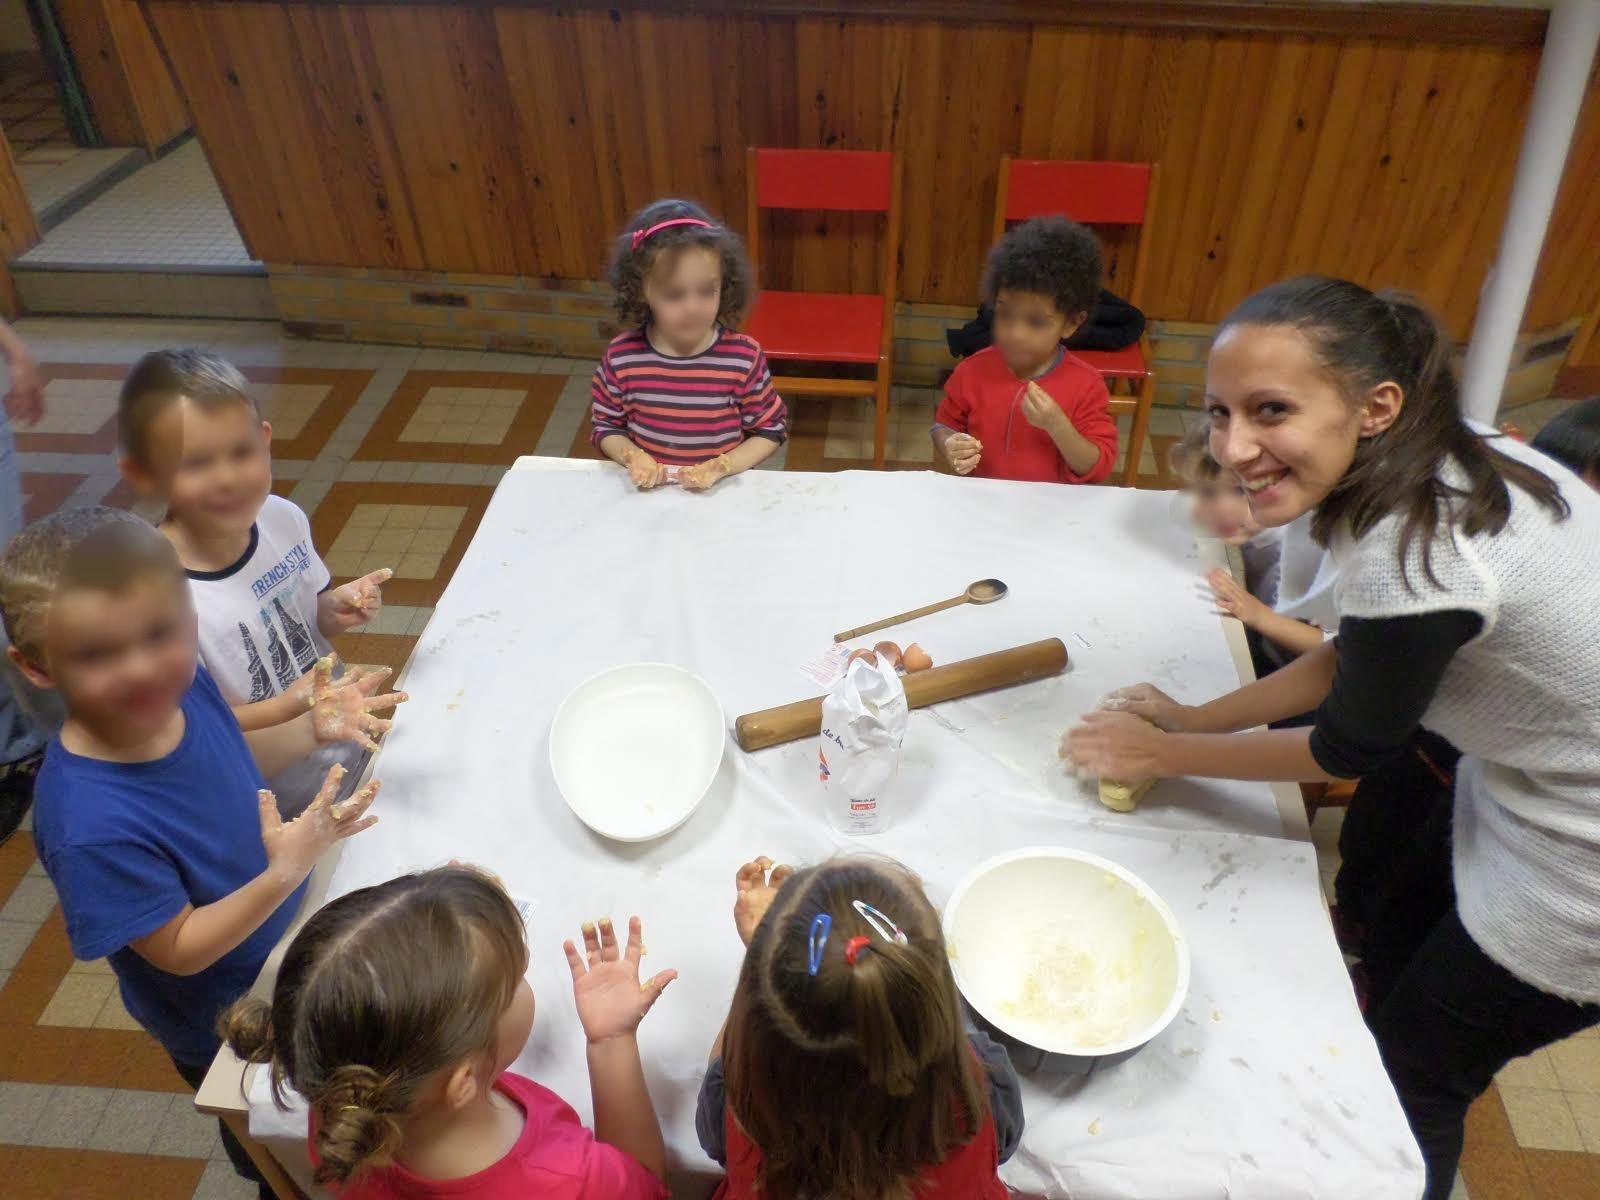 Martina (italienne) en stage d'animation avec de jeunes enfants / Martina running recreational activities for children